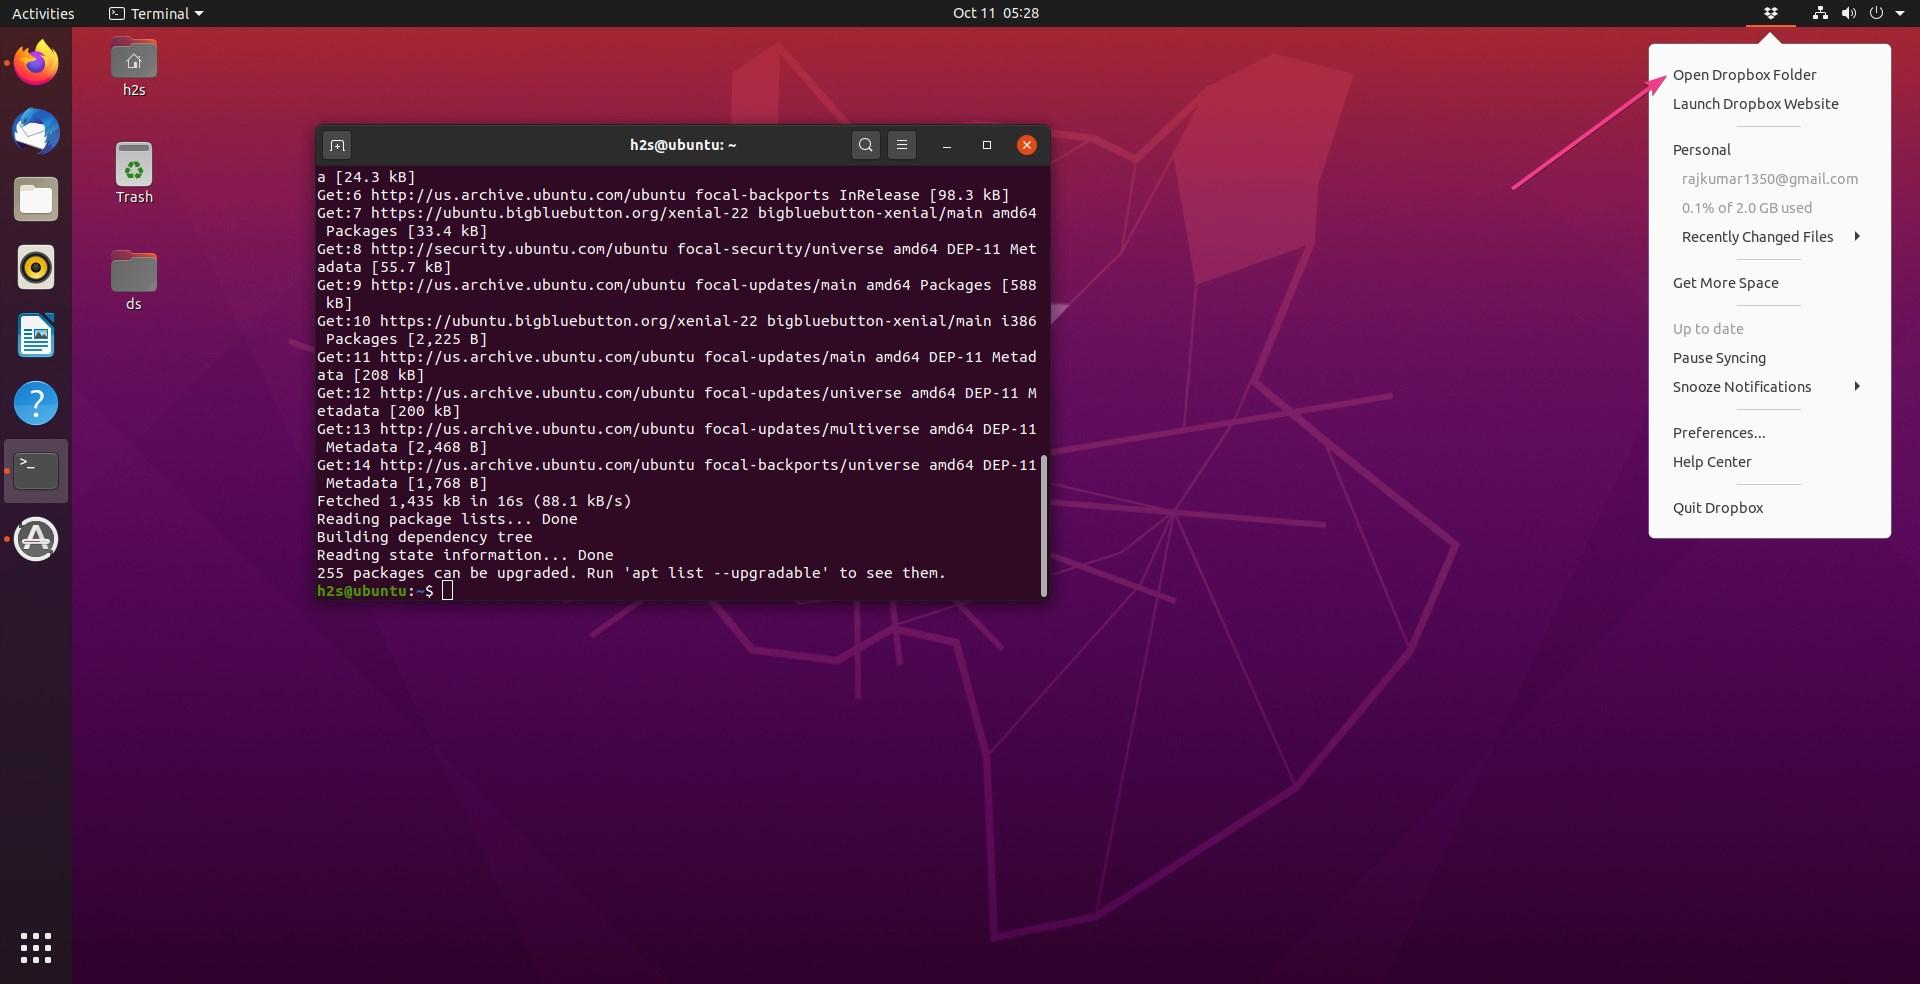 Access Dropbox Headless on Ubuntu 20.04 server